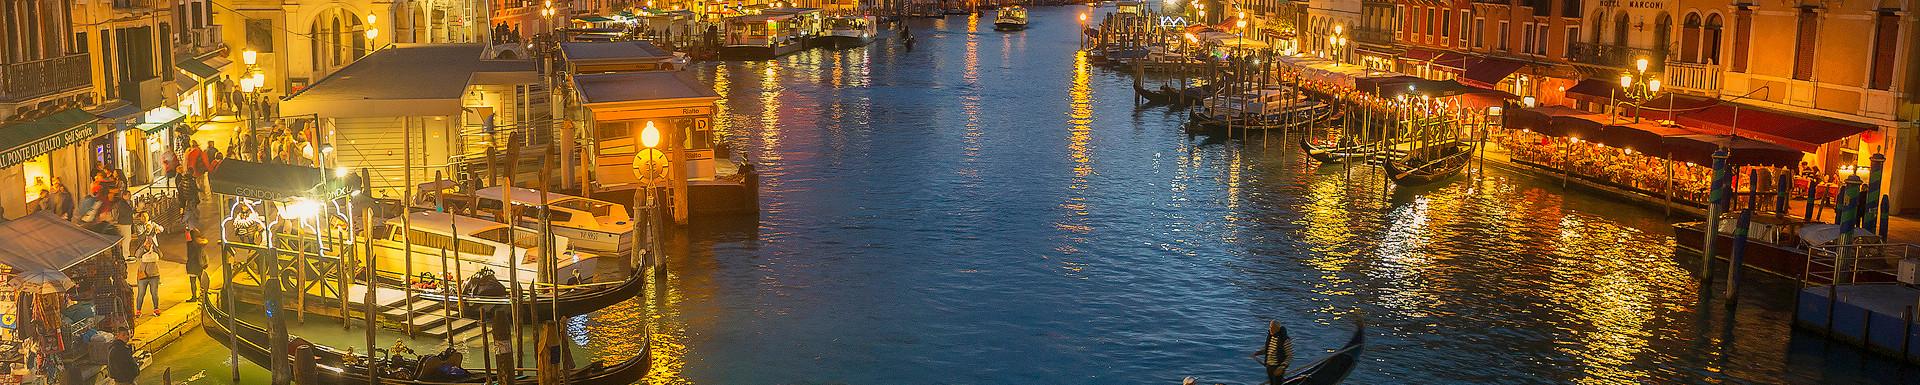 Twilight on the Rialto